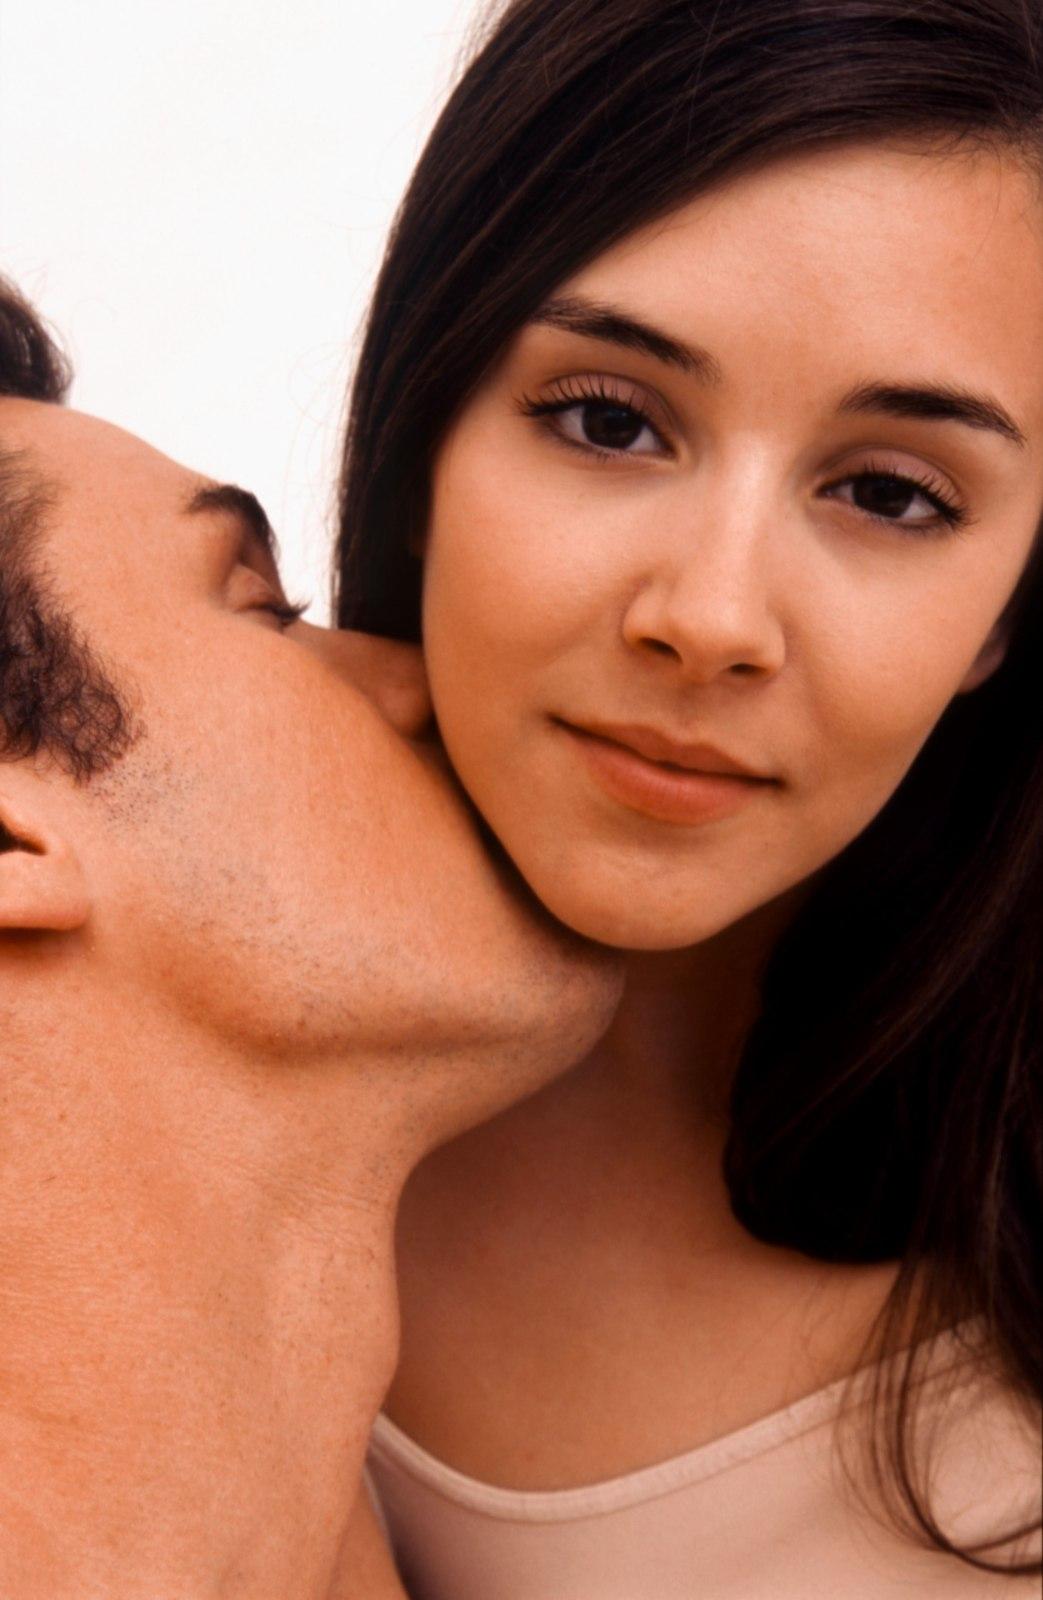 Девушка целует мужчину в шею фото